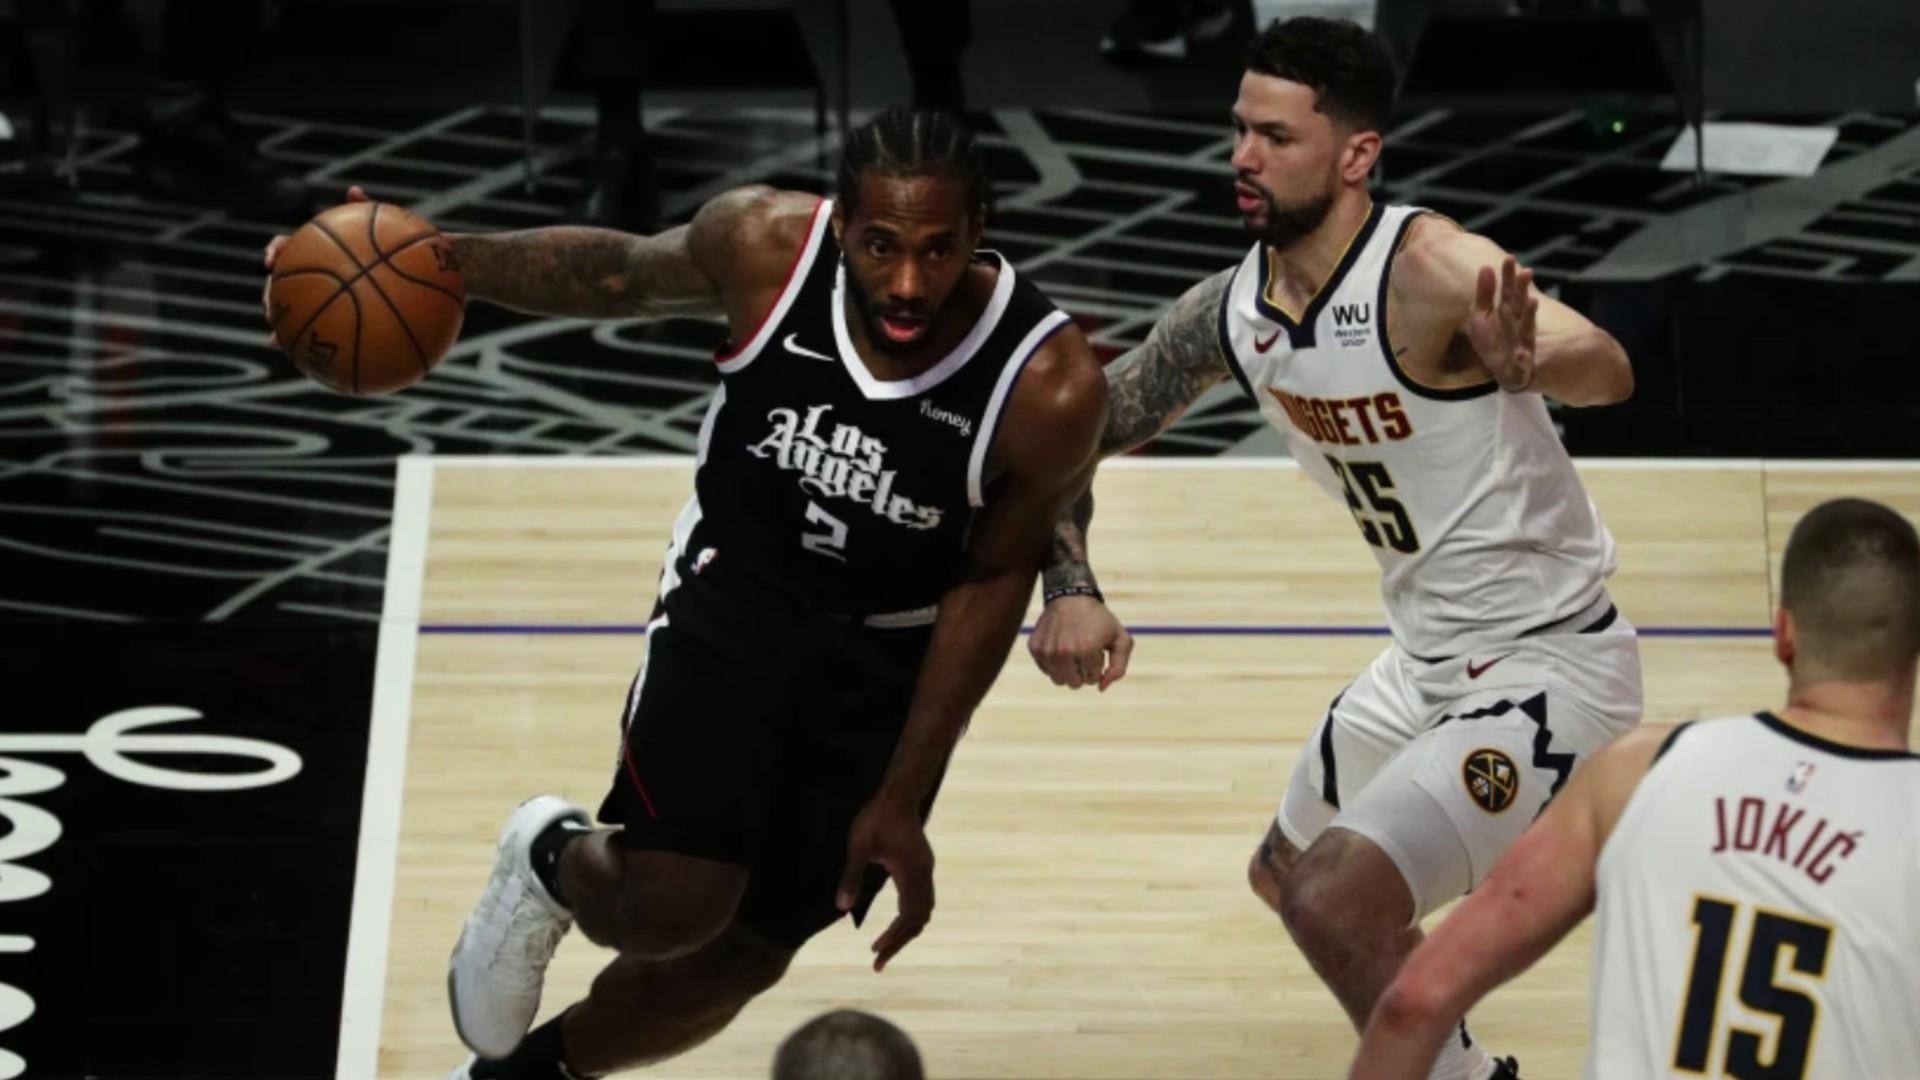 Clippers forward Kawhi Leonard drives the baseline against Utah.(Gina Ferazzi/Los Angeles Times)